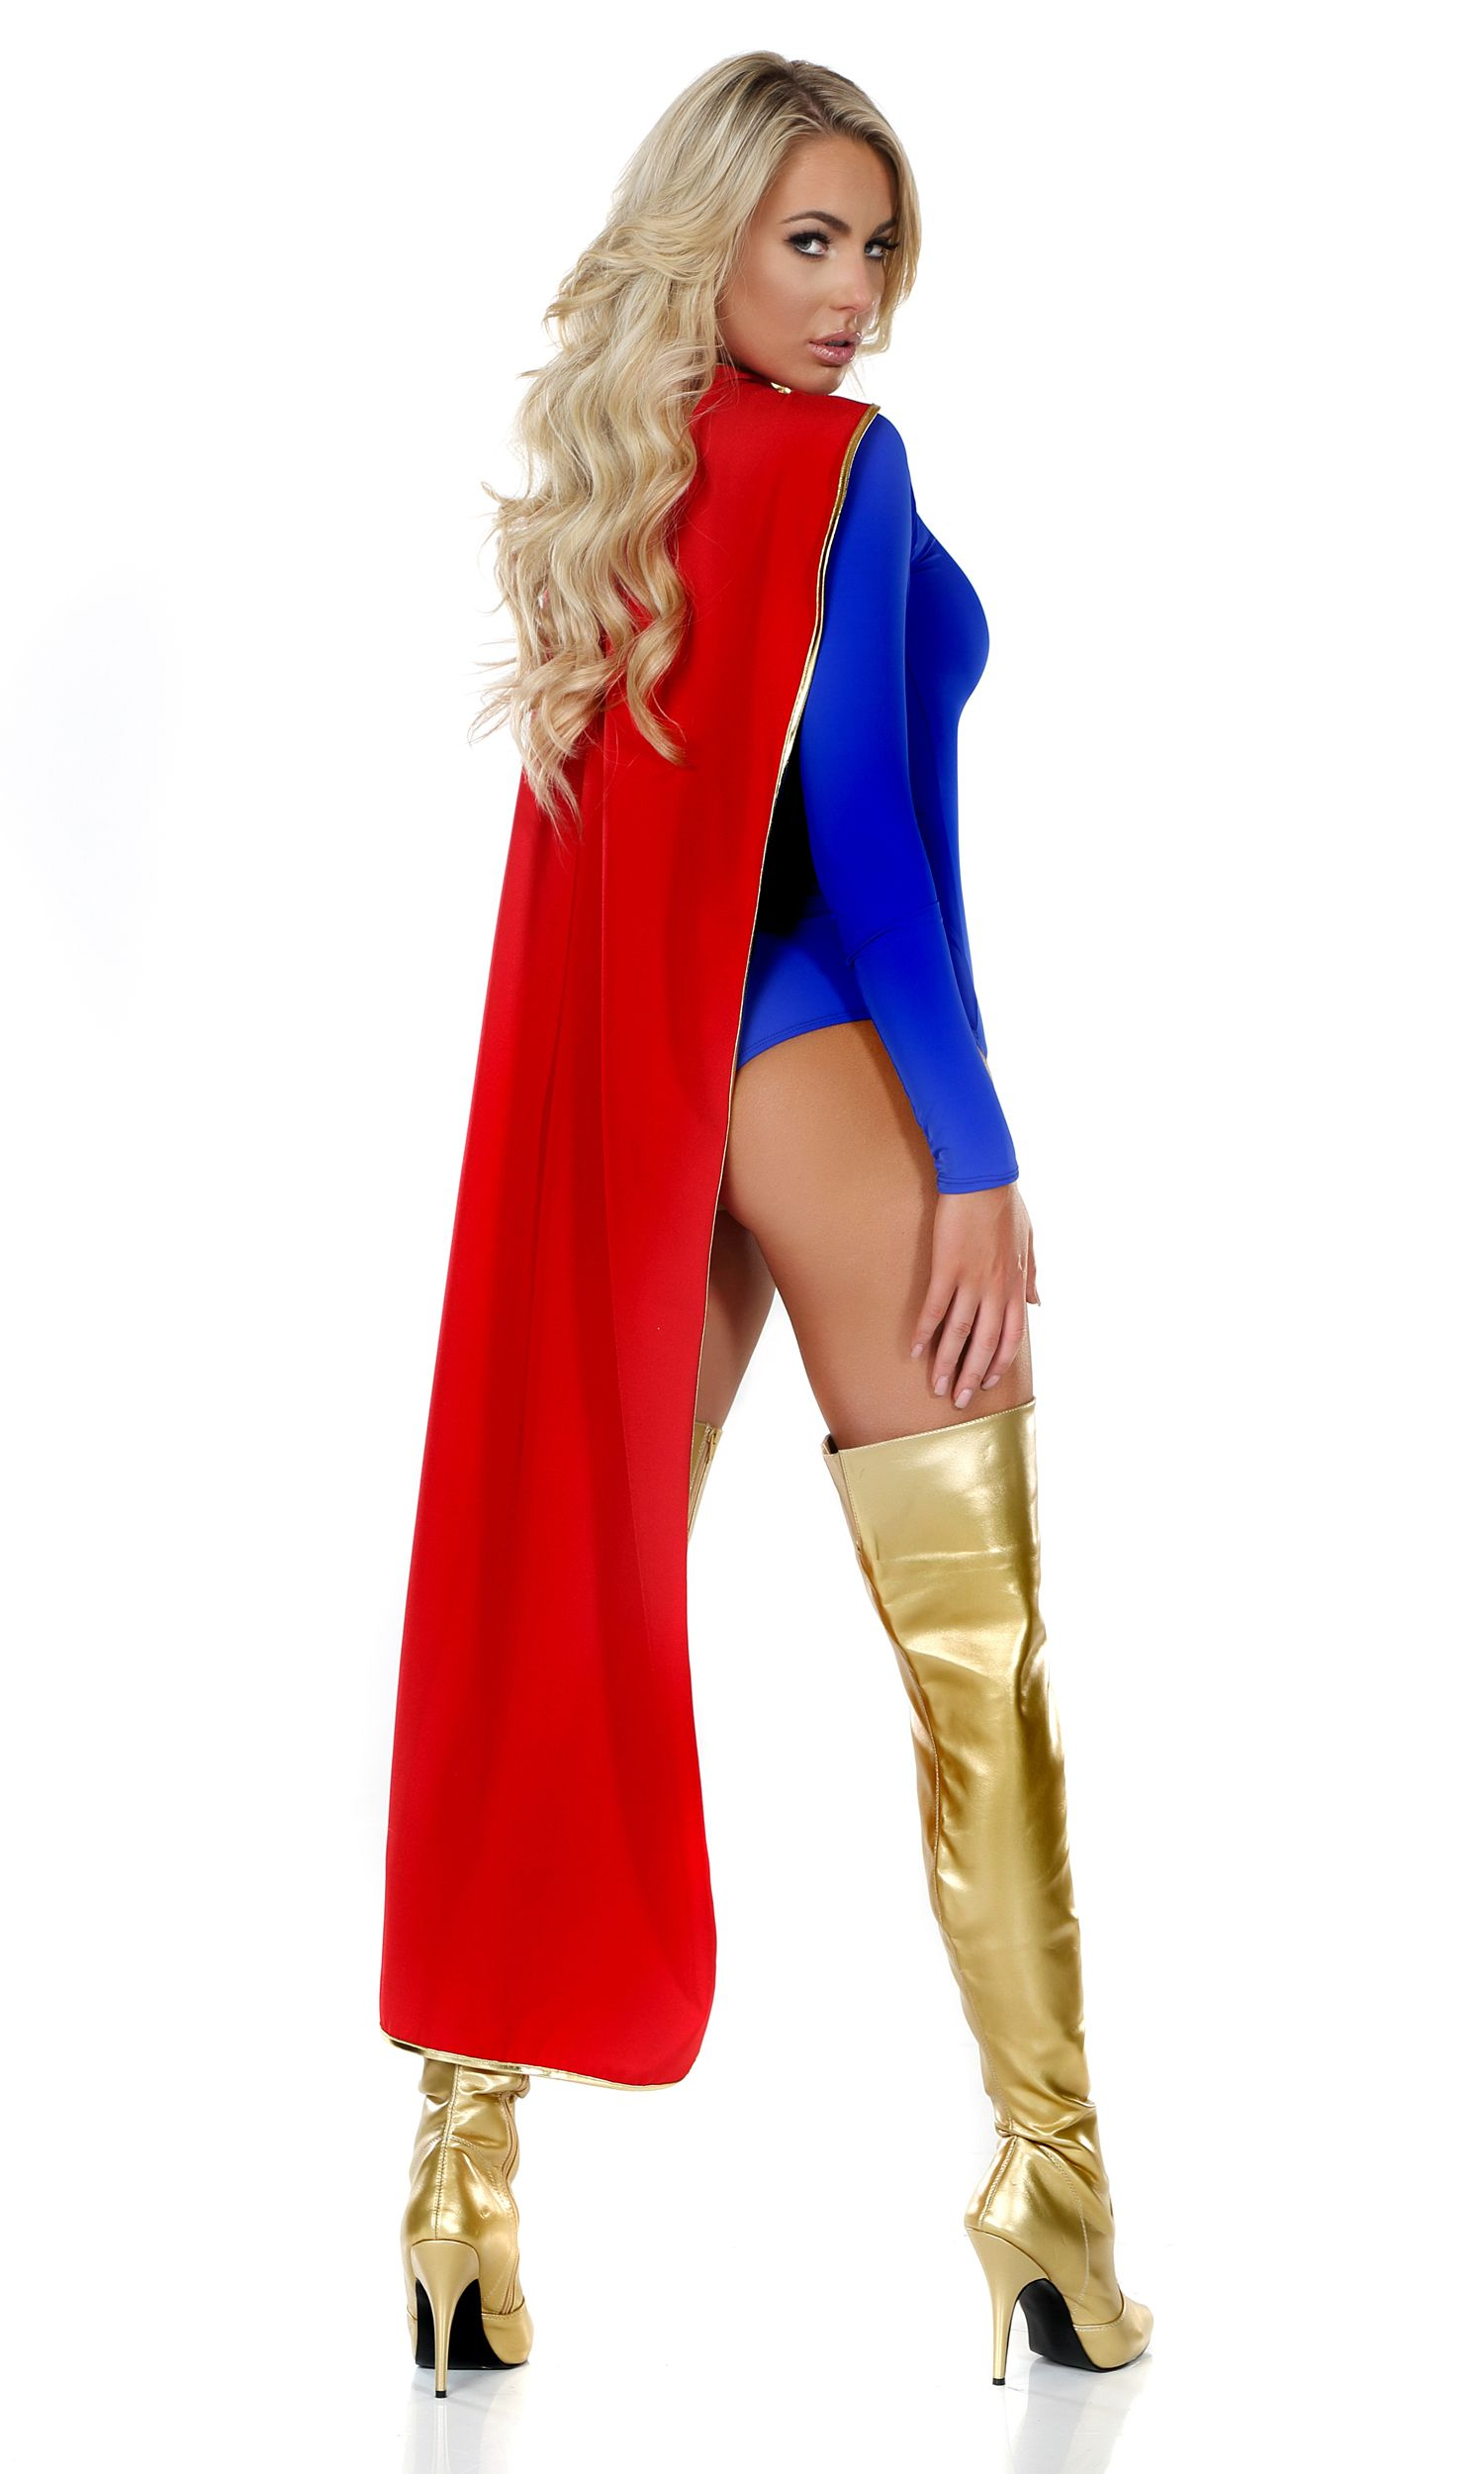 Sexy Superheroine